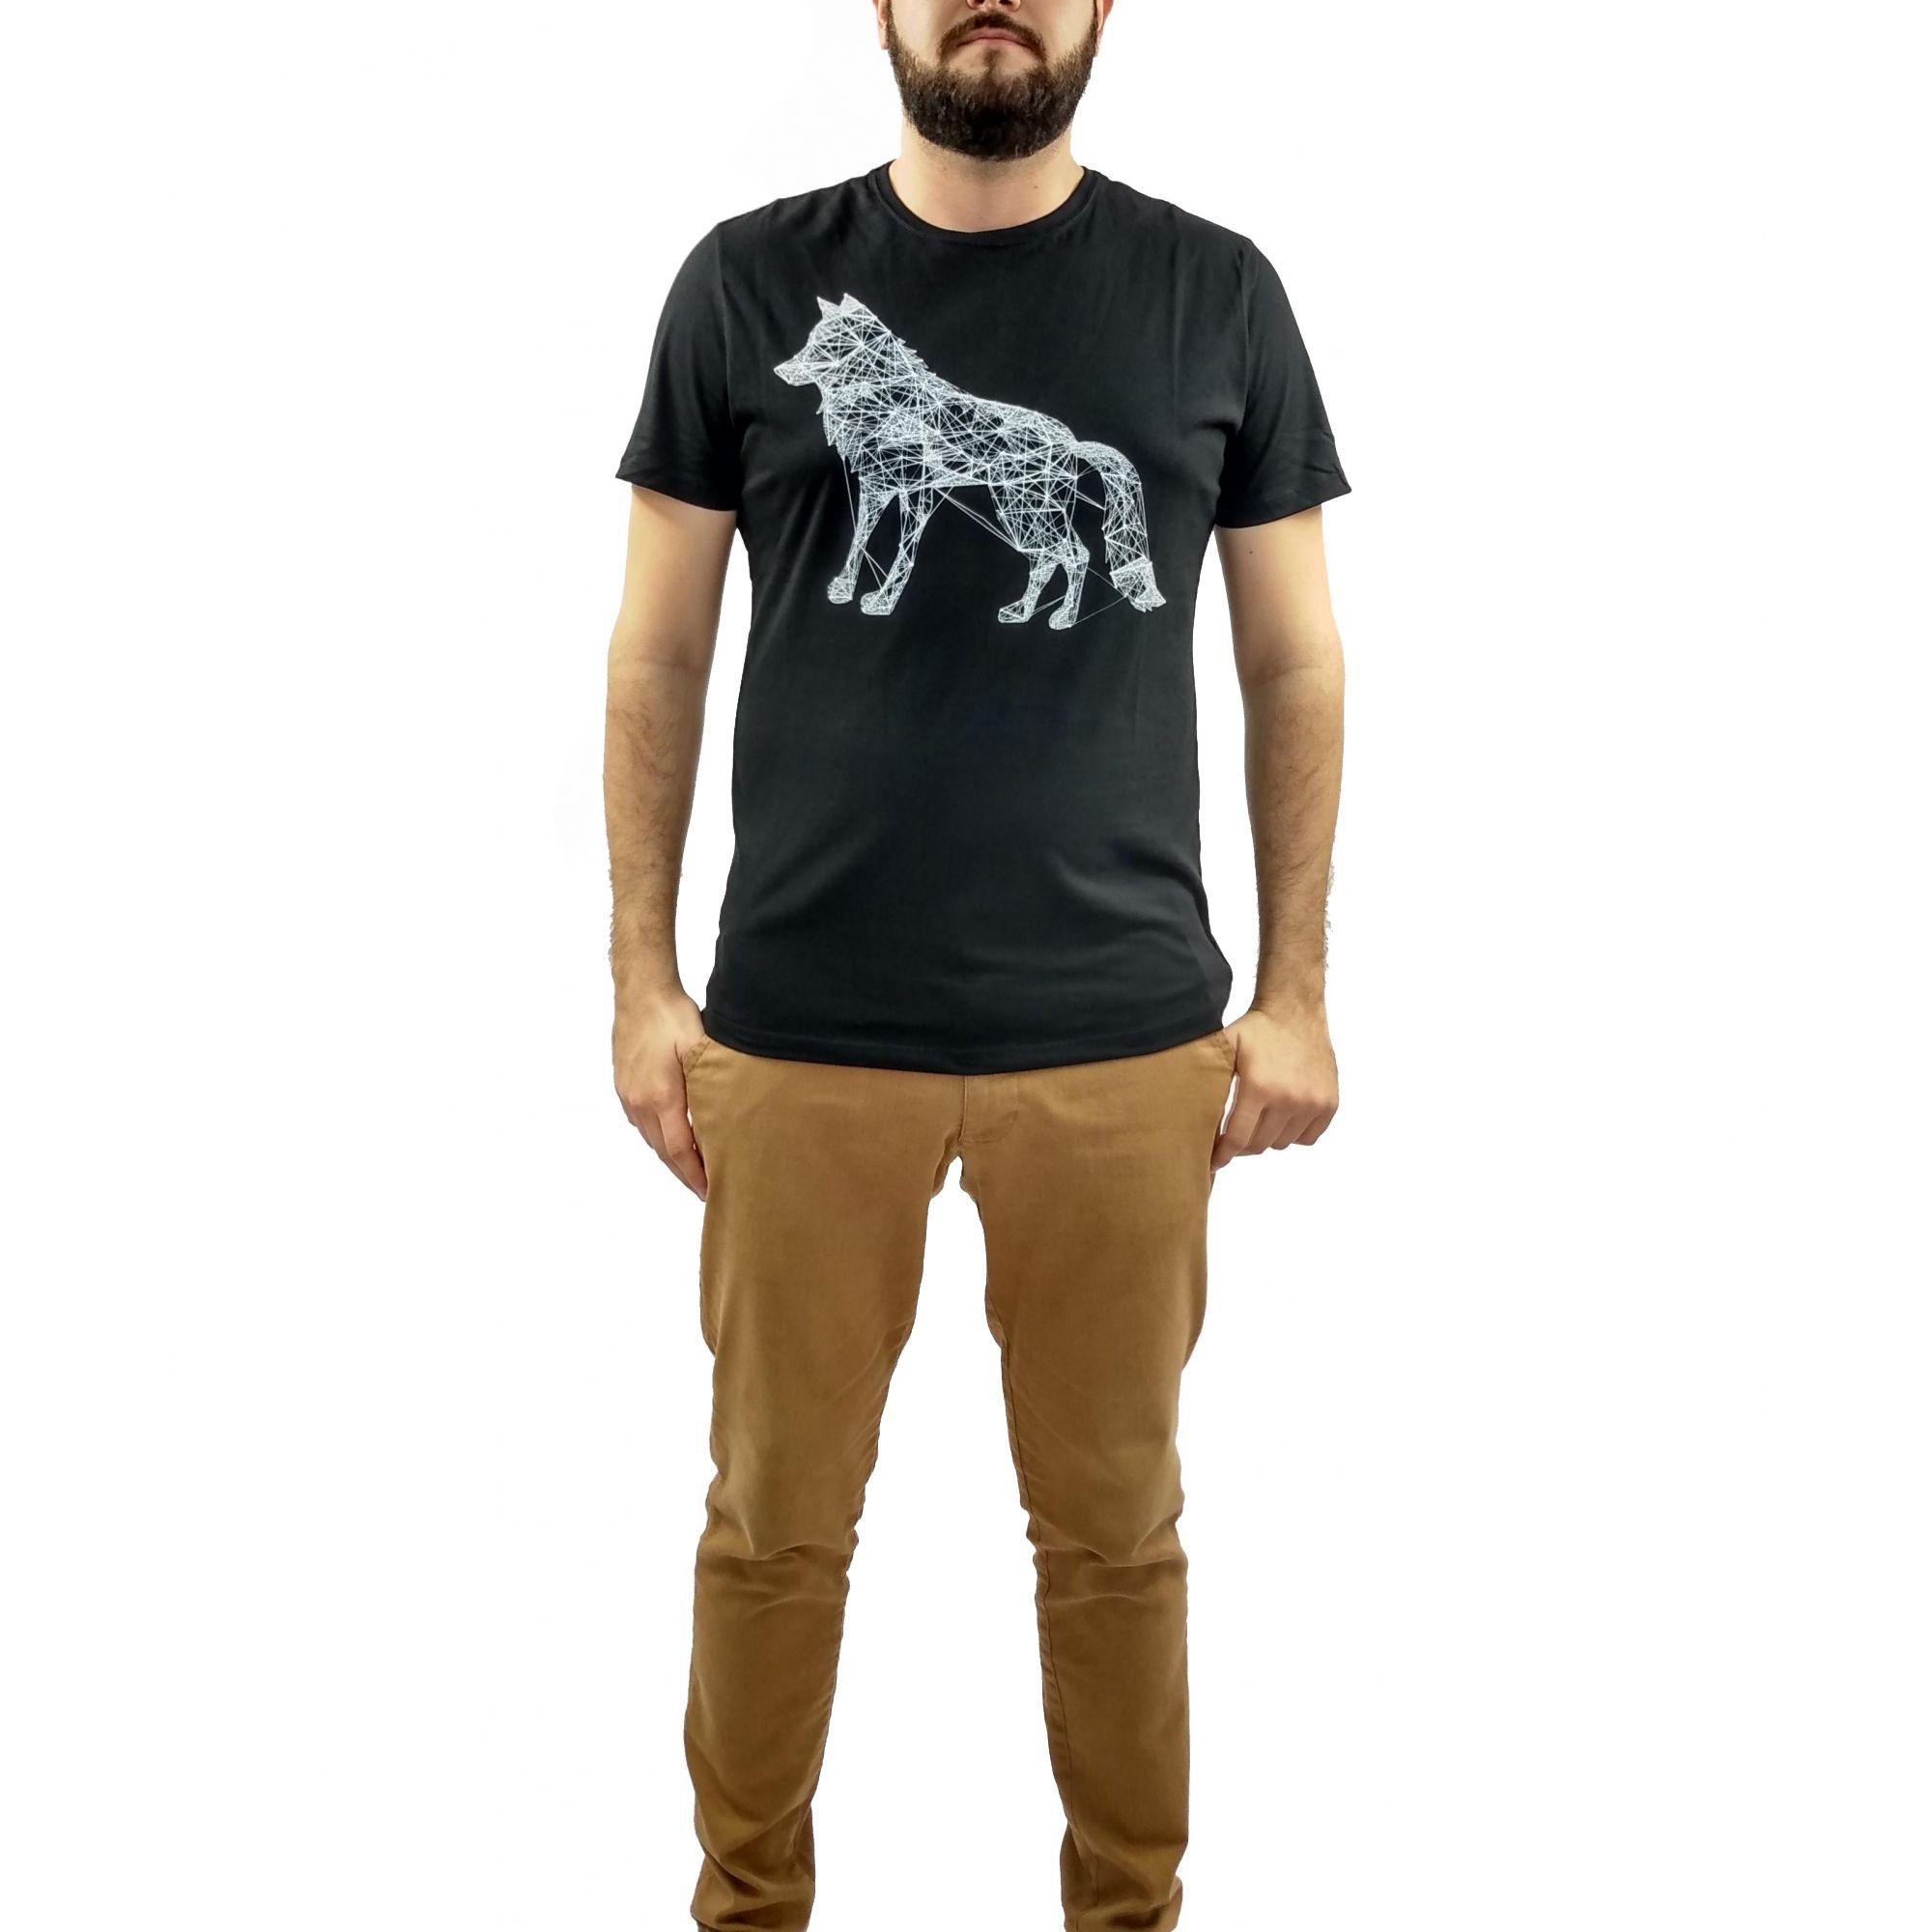 Camiseta Acostamento Masculina Lobo Preta